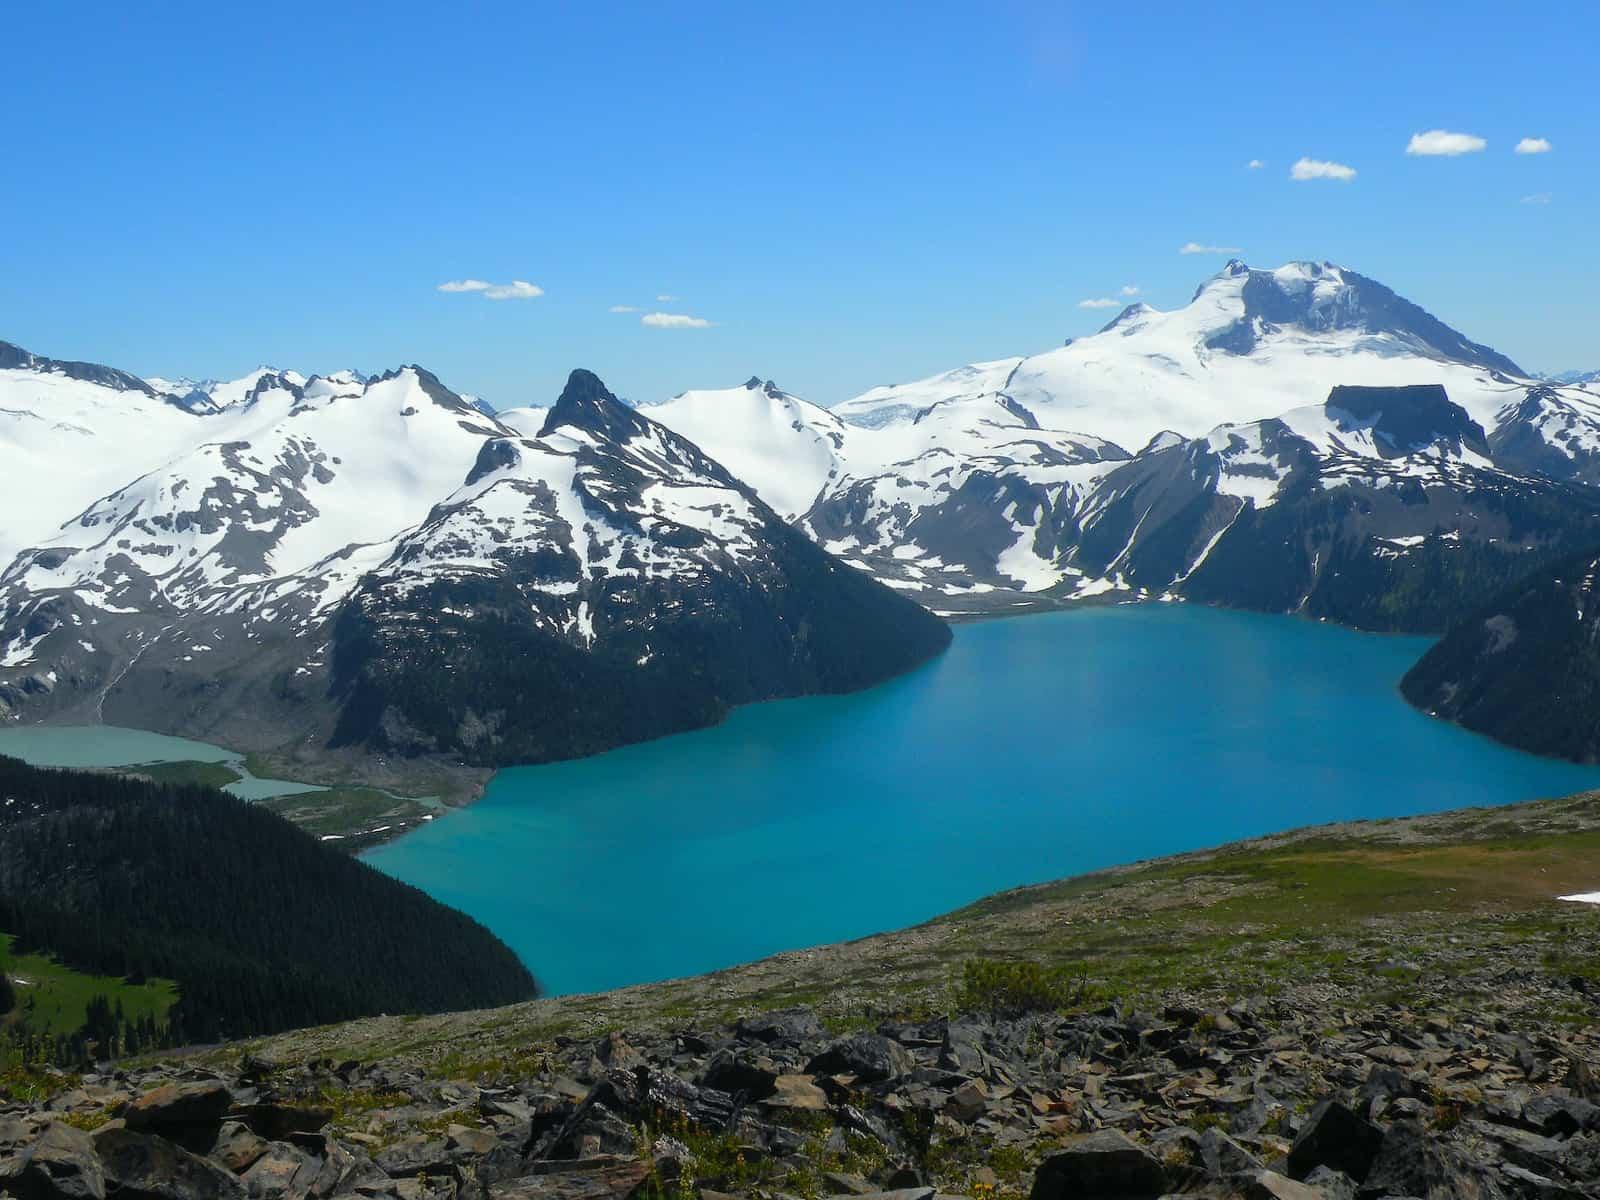 British Columbias 18 Sleeping Volcanoes Explore Magazine Cinder Cone Volcano Cones Shield